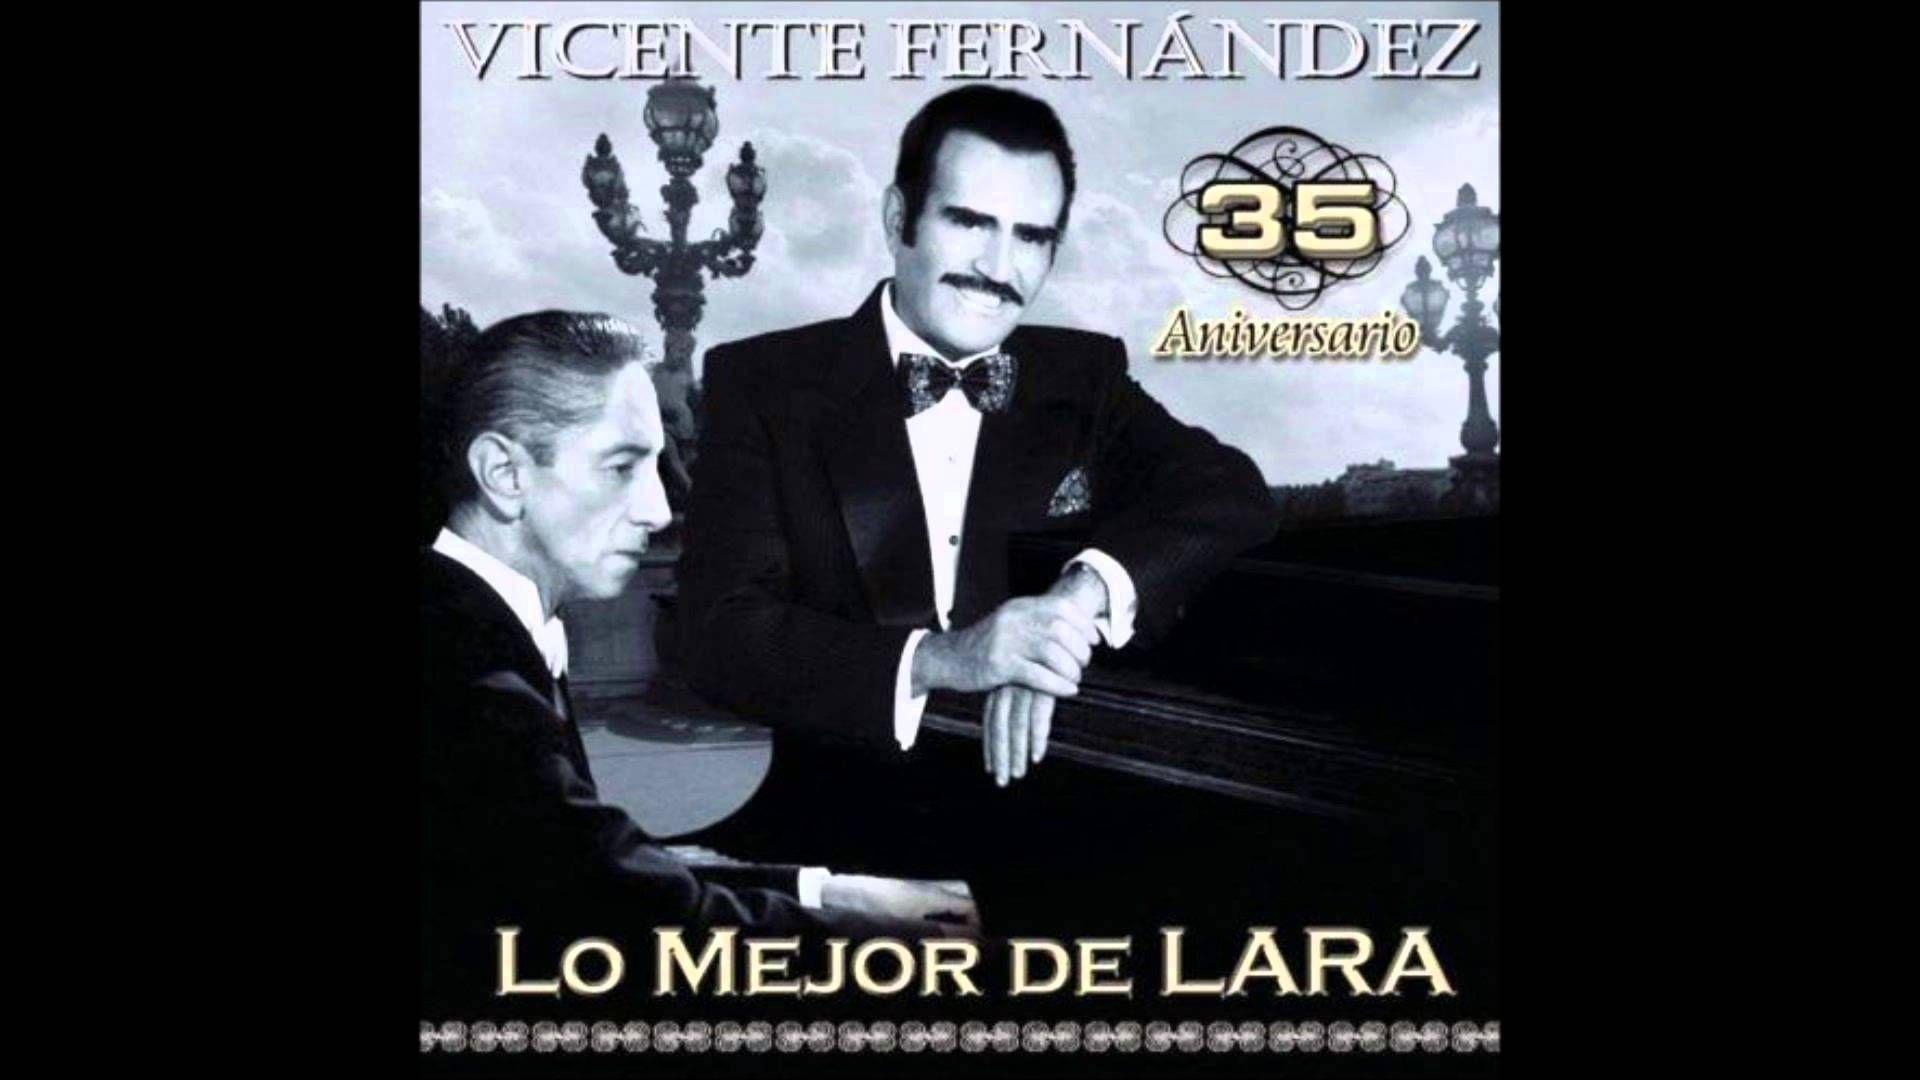 Vicente Fernandez Lo Mejor De Agustin Lara Disco Completo